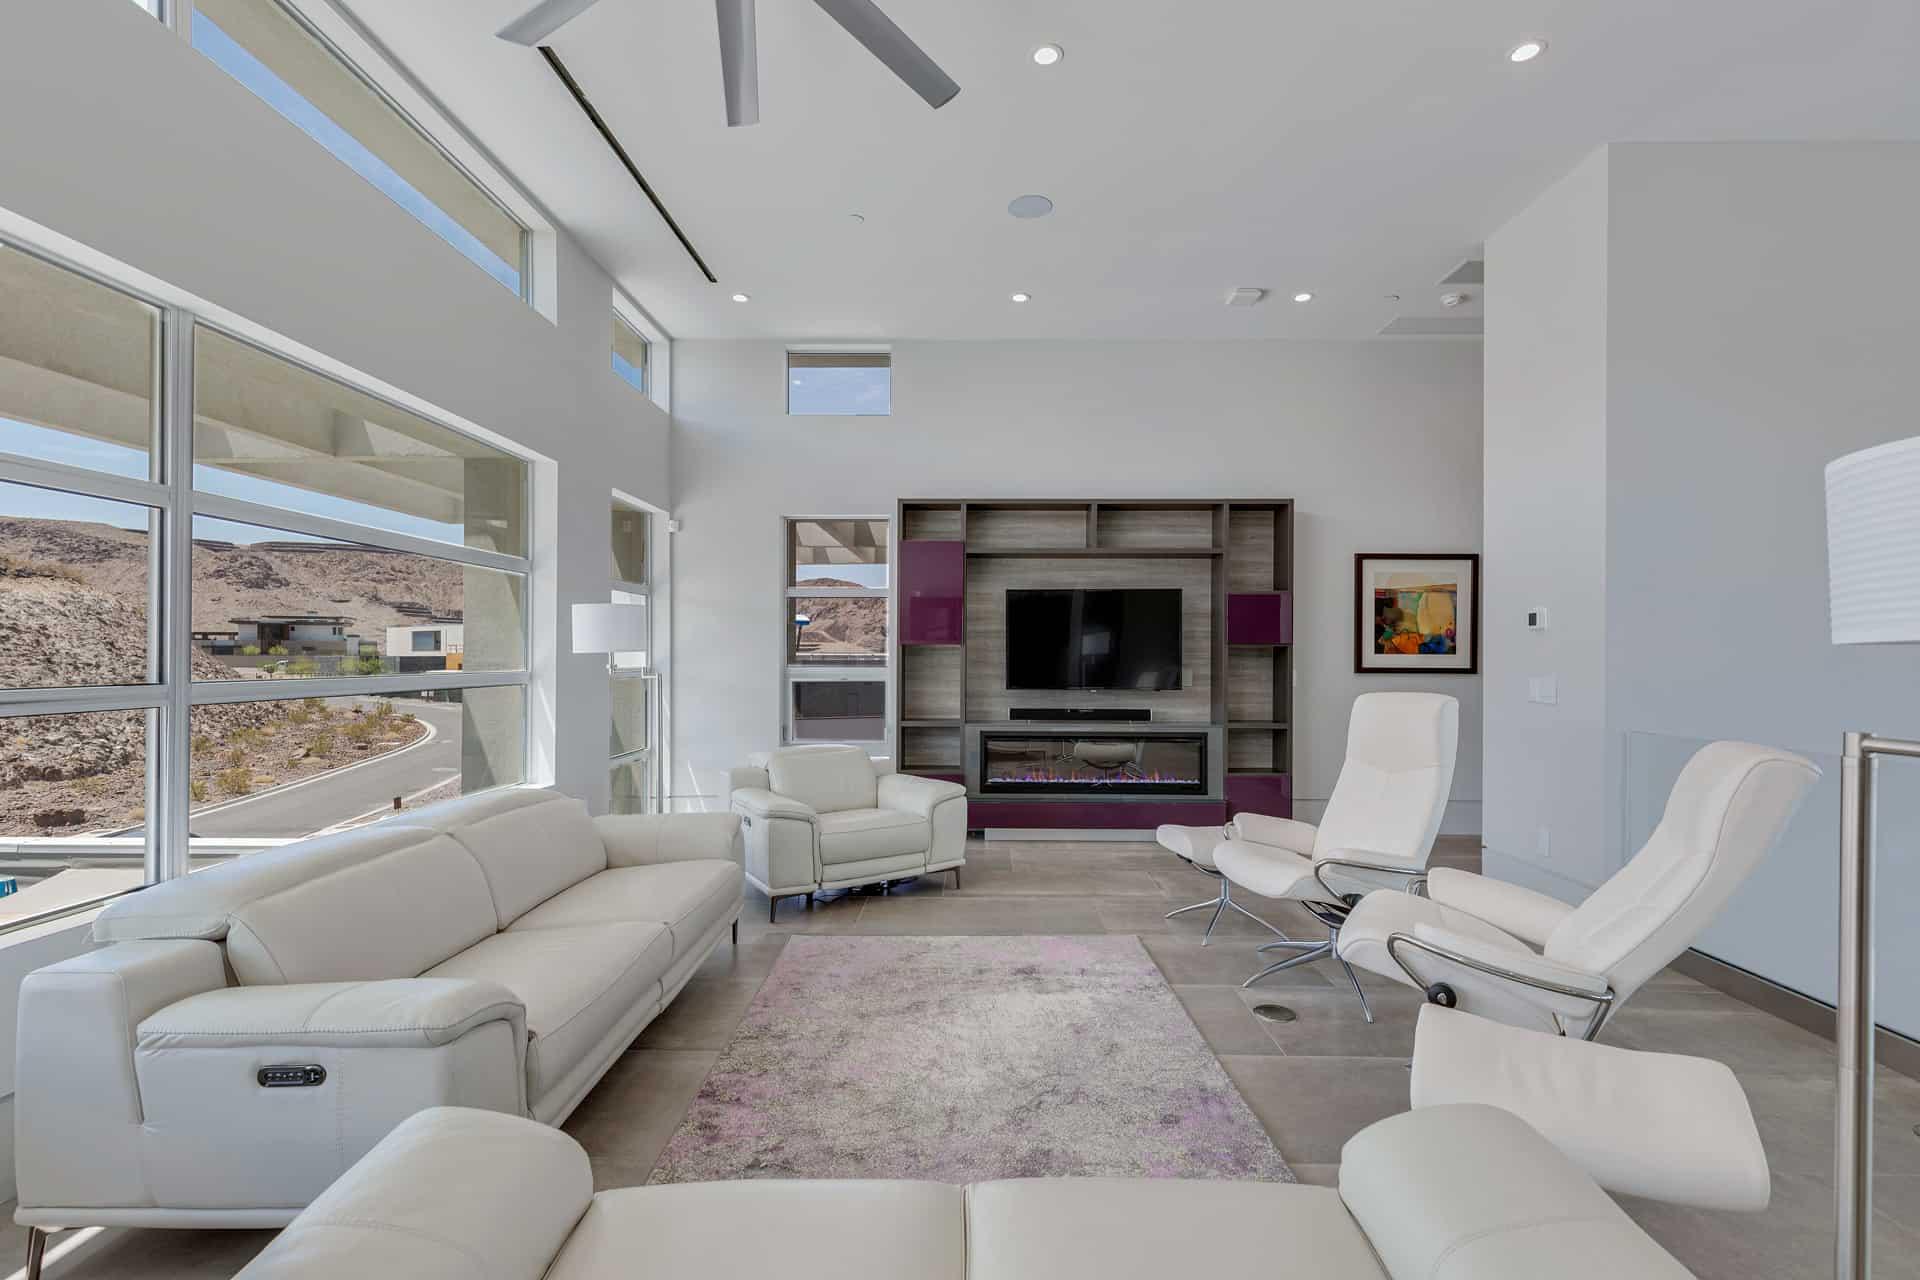 las-vegas-luxry-real-estate-realtor-rob-jensen-company-5-rockstream-drive-ascaya053